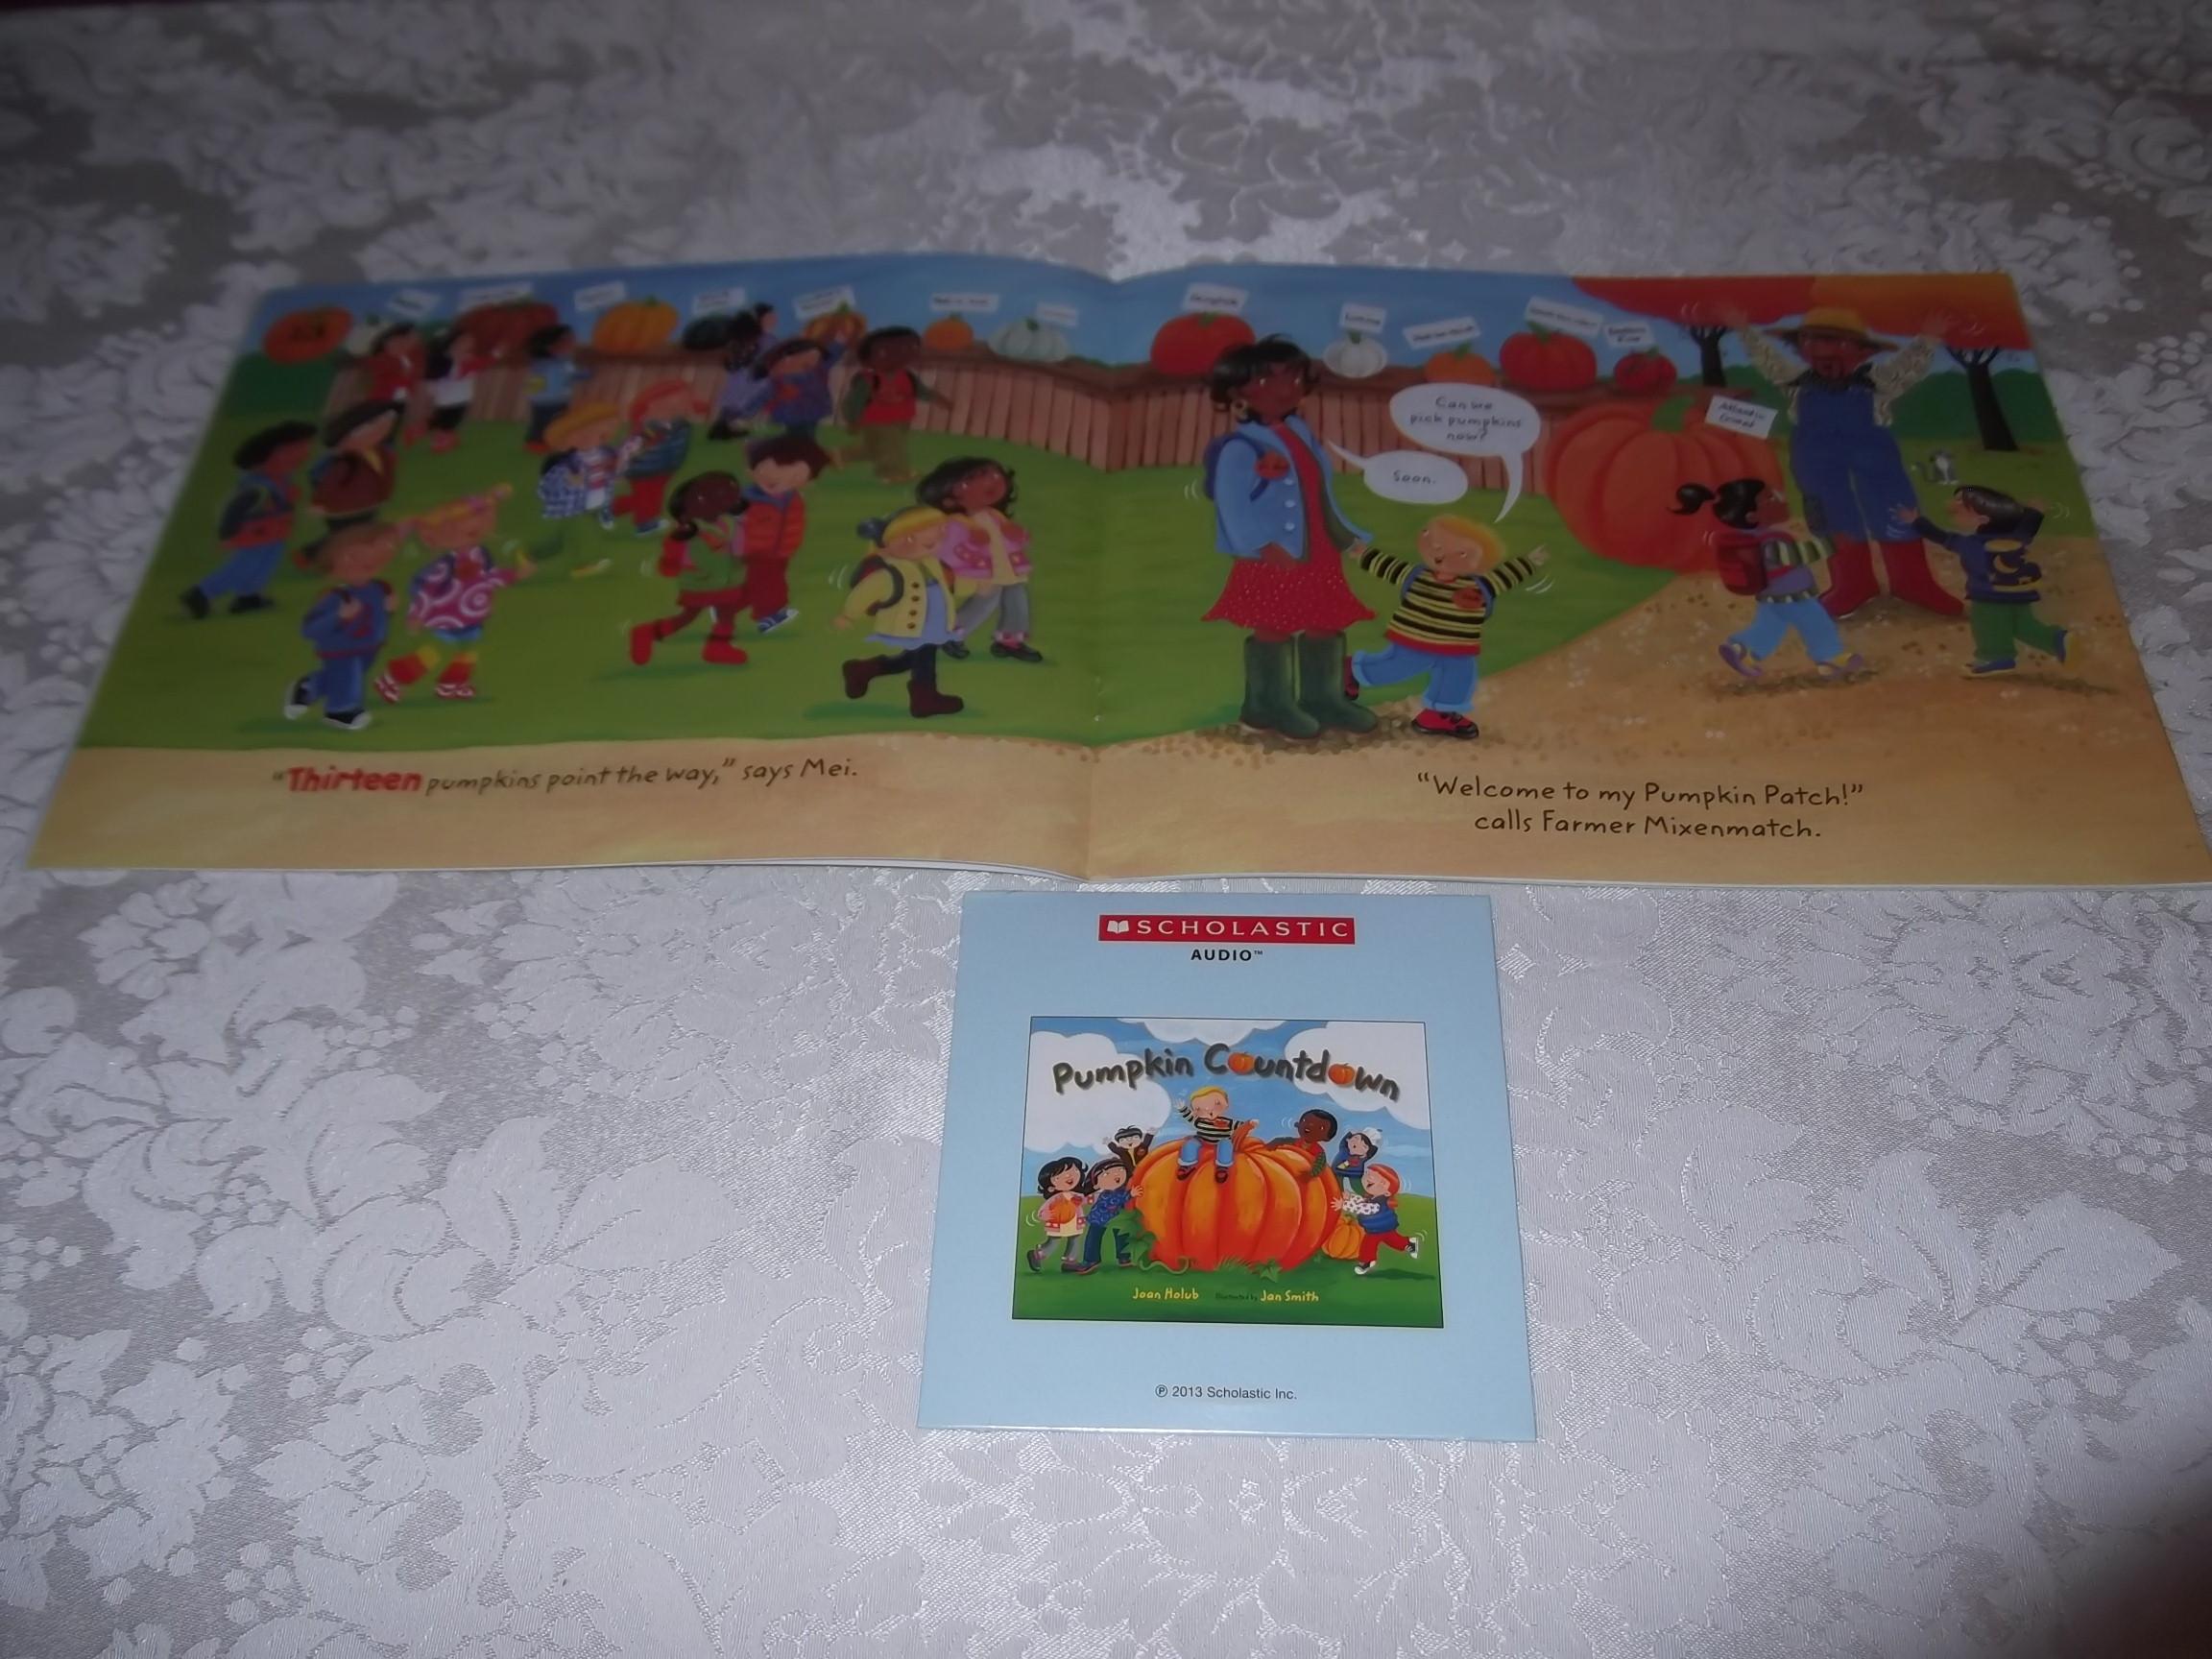 Image 3 of Pumpkin Countdown Joan Holub Audio CD & SC Set Brand New